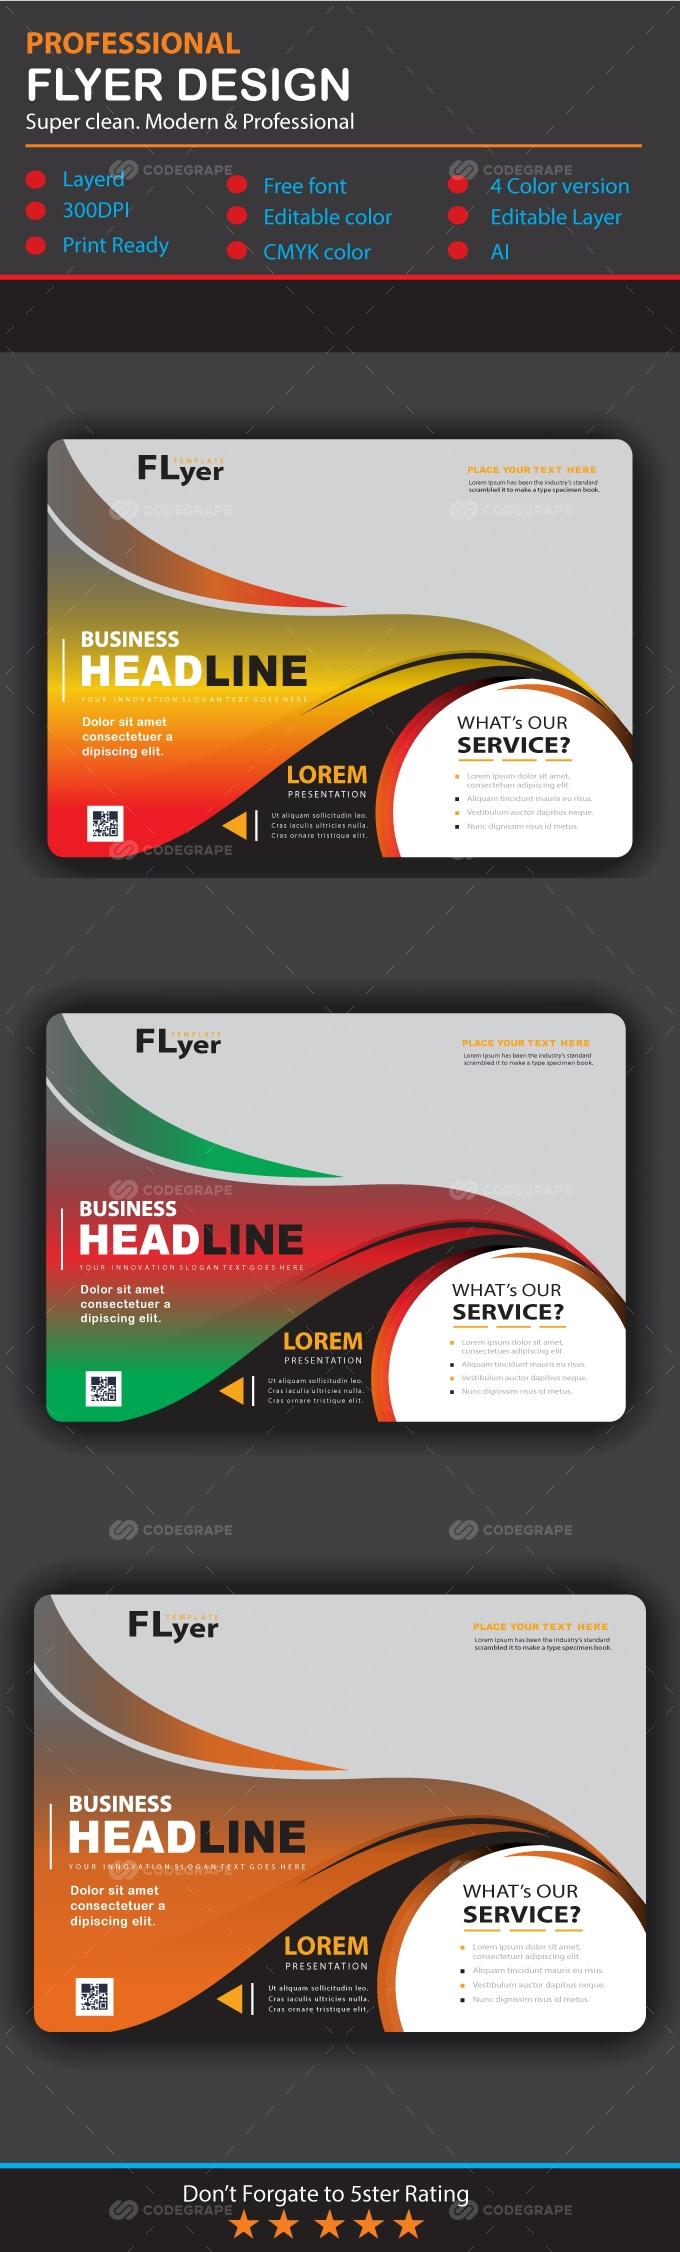 Clean Flyer Design Template